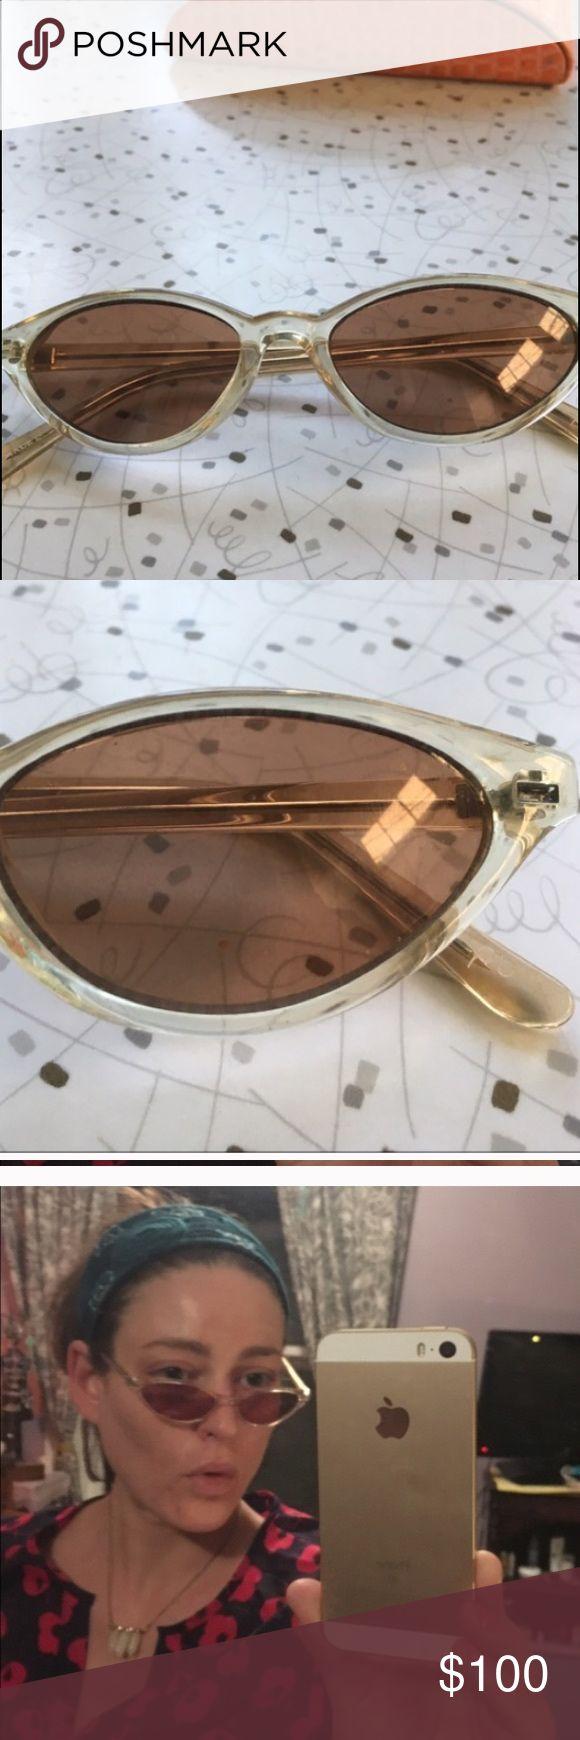 Retro women's sunglasses. No scratches! Gorgeous champagne plastic frames. 1950's / 60's style. Accessories Sunglasses